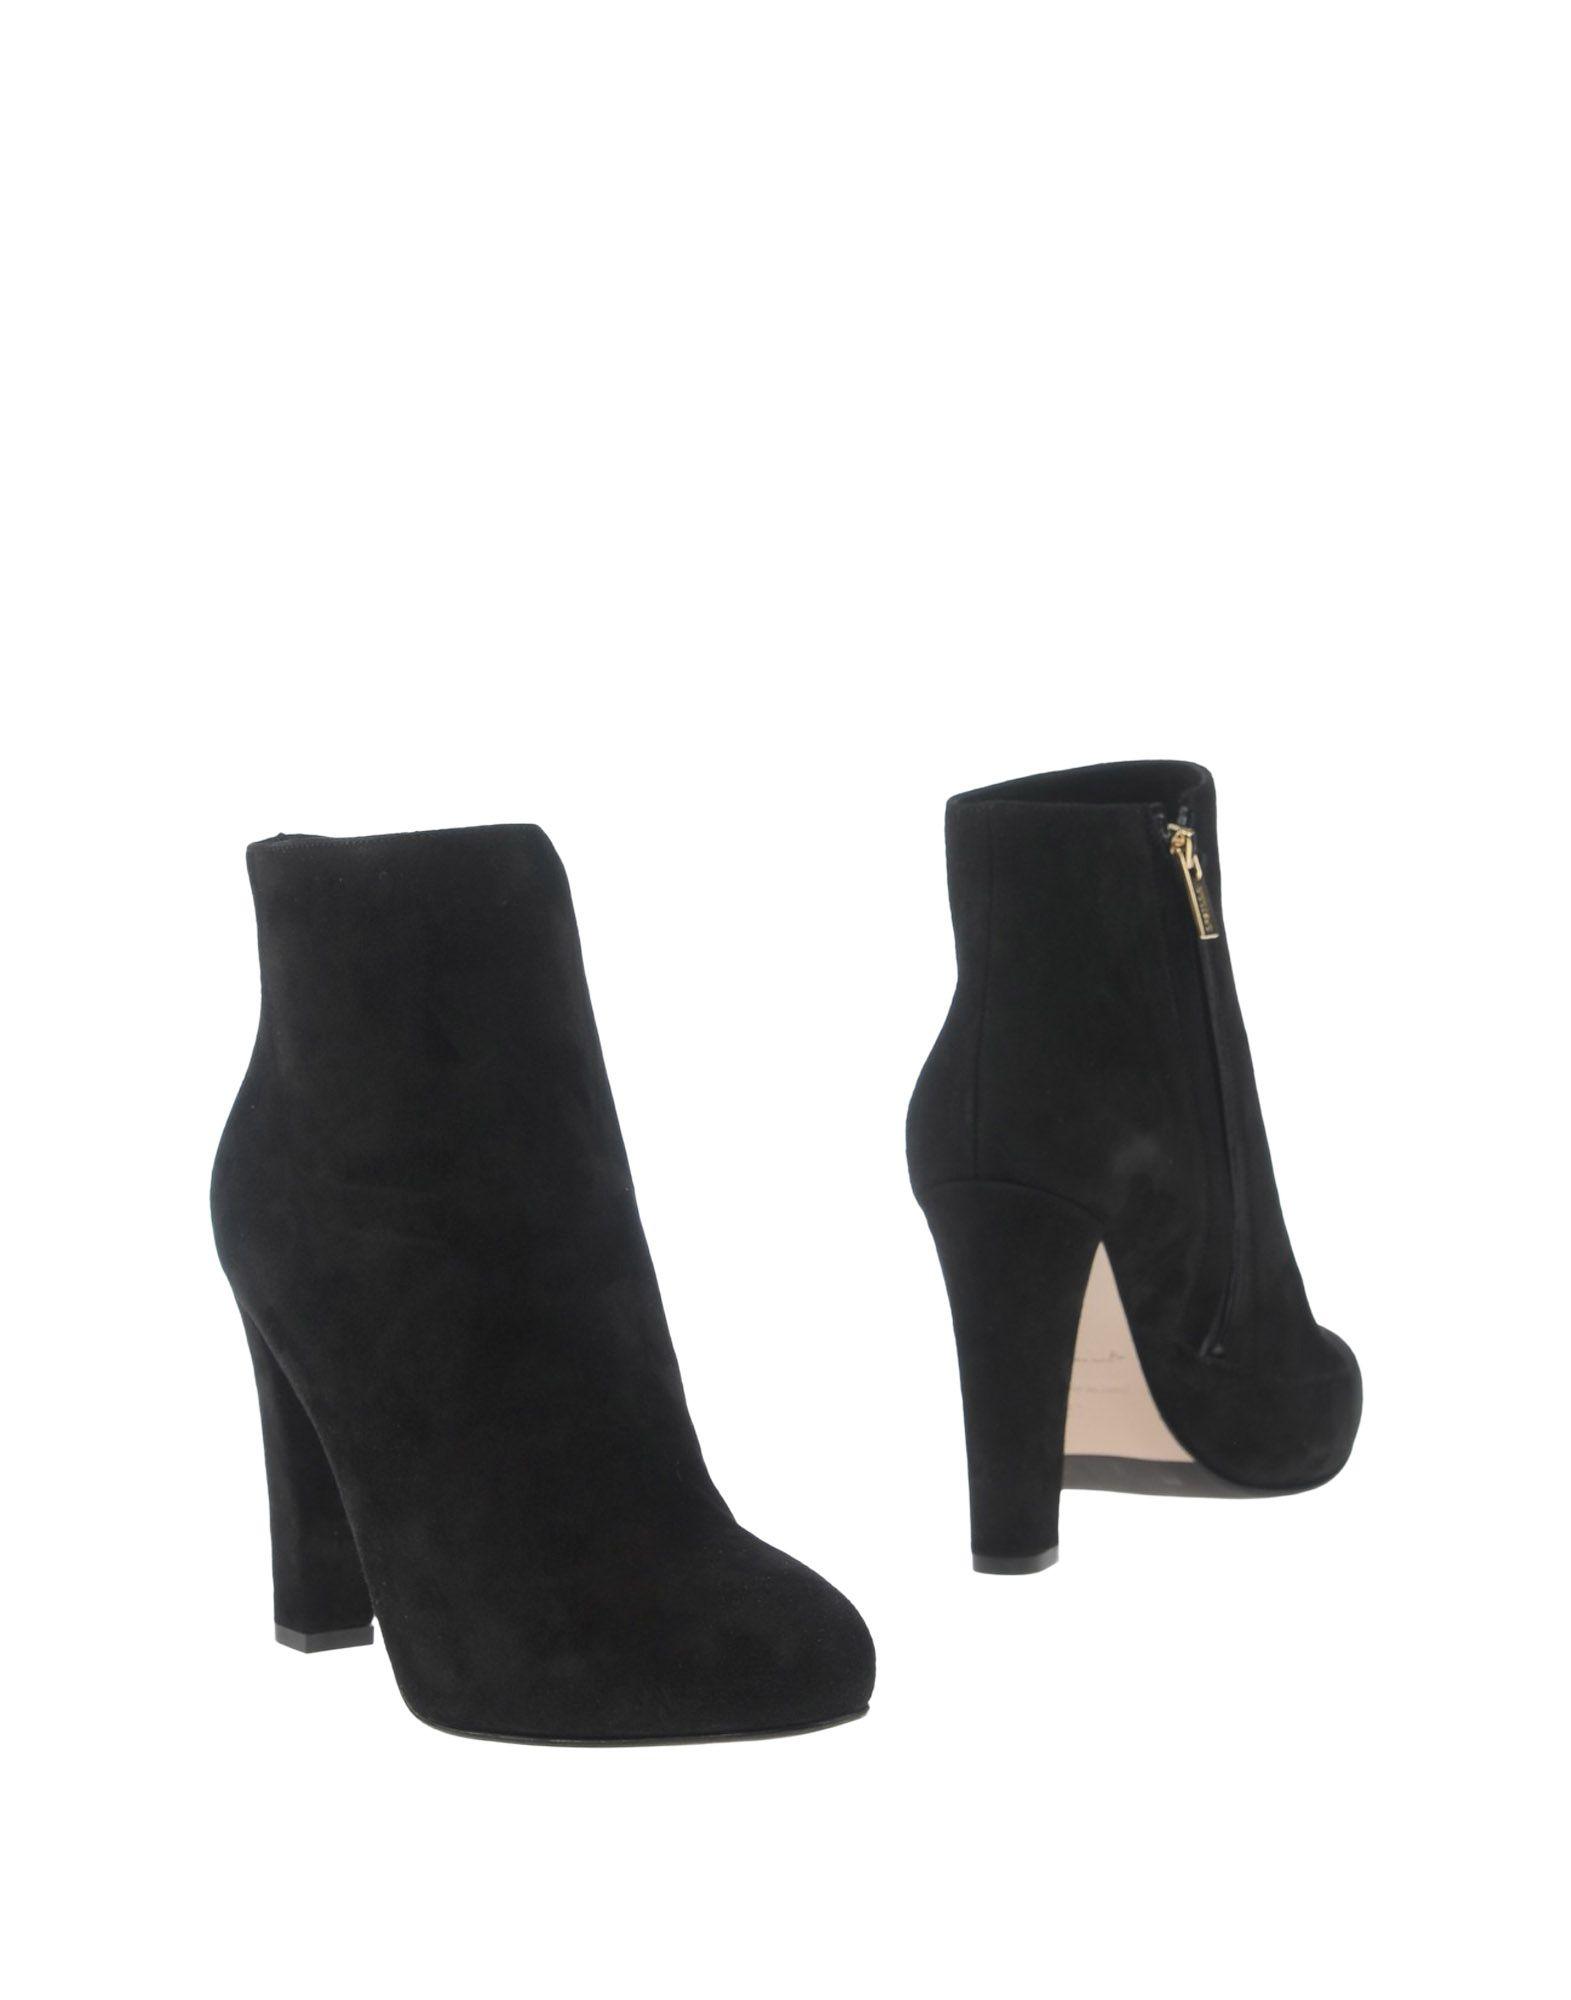 Le Silla Stiefelette Damen  11287487QHGut aussehende aussehende aussehende strapazierfähige Schuhe ad8df1